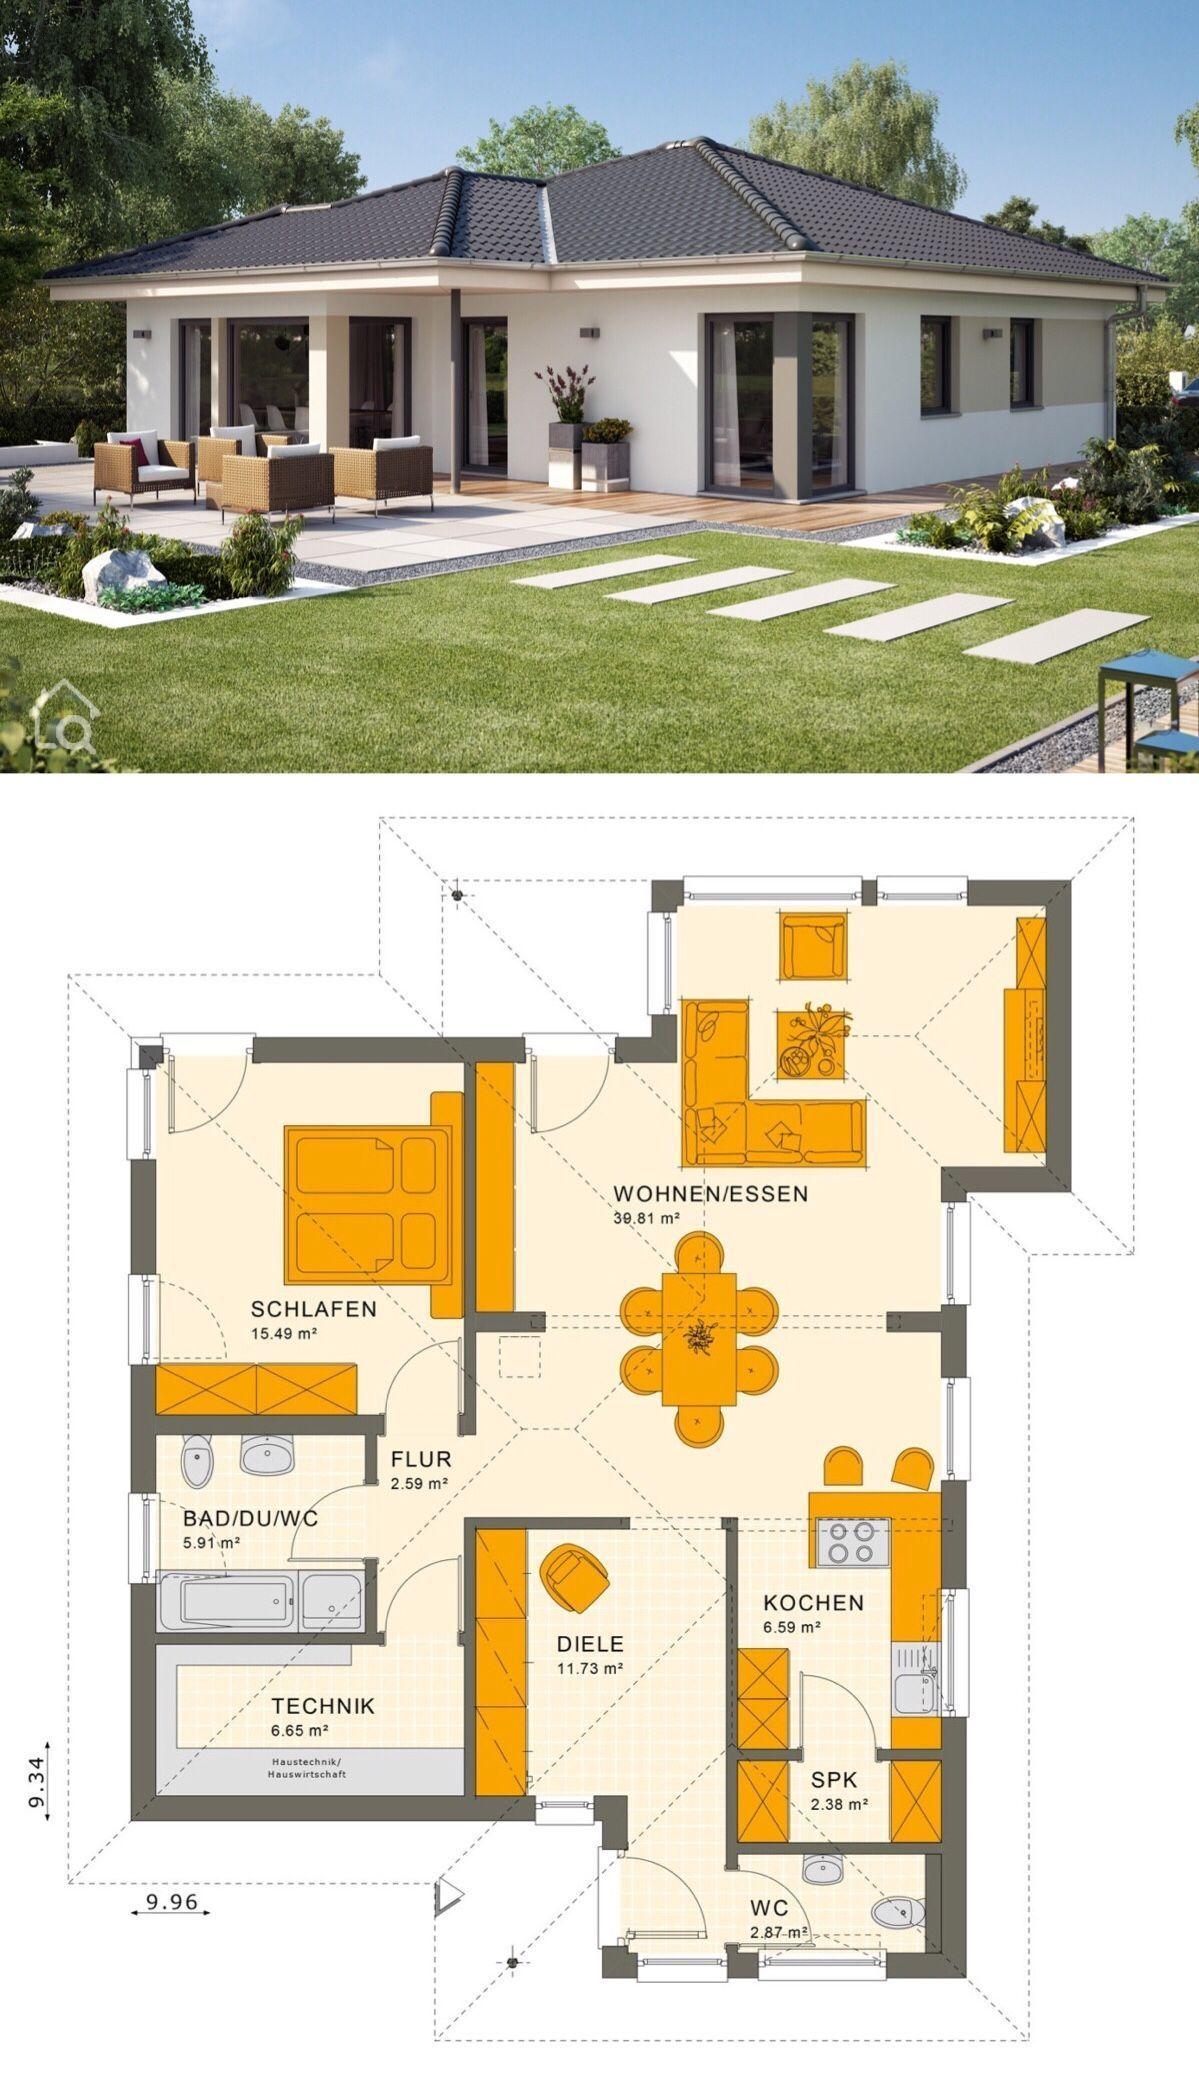 Winkelbungalow Solution 78 V8 Mit Walmdach Living Haus Hausbaudirekt B Plans Petite Maison Moderne Maison Architecte Moderne Construction Maison Moderne